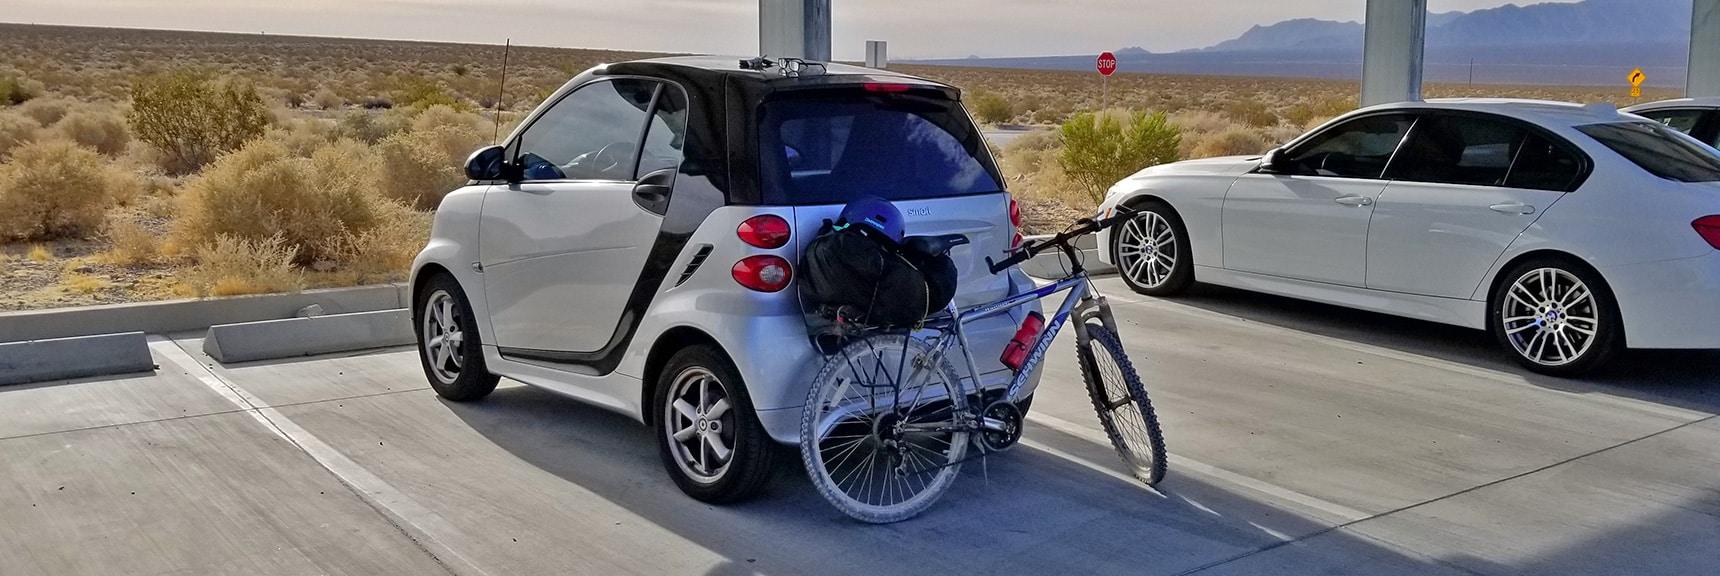 Mounting the Back Pack with Dust Cover Onto Bike's Back Rack| Smart Car Bike Rack and Mountain Bike Test, Sheep Range, Nevada